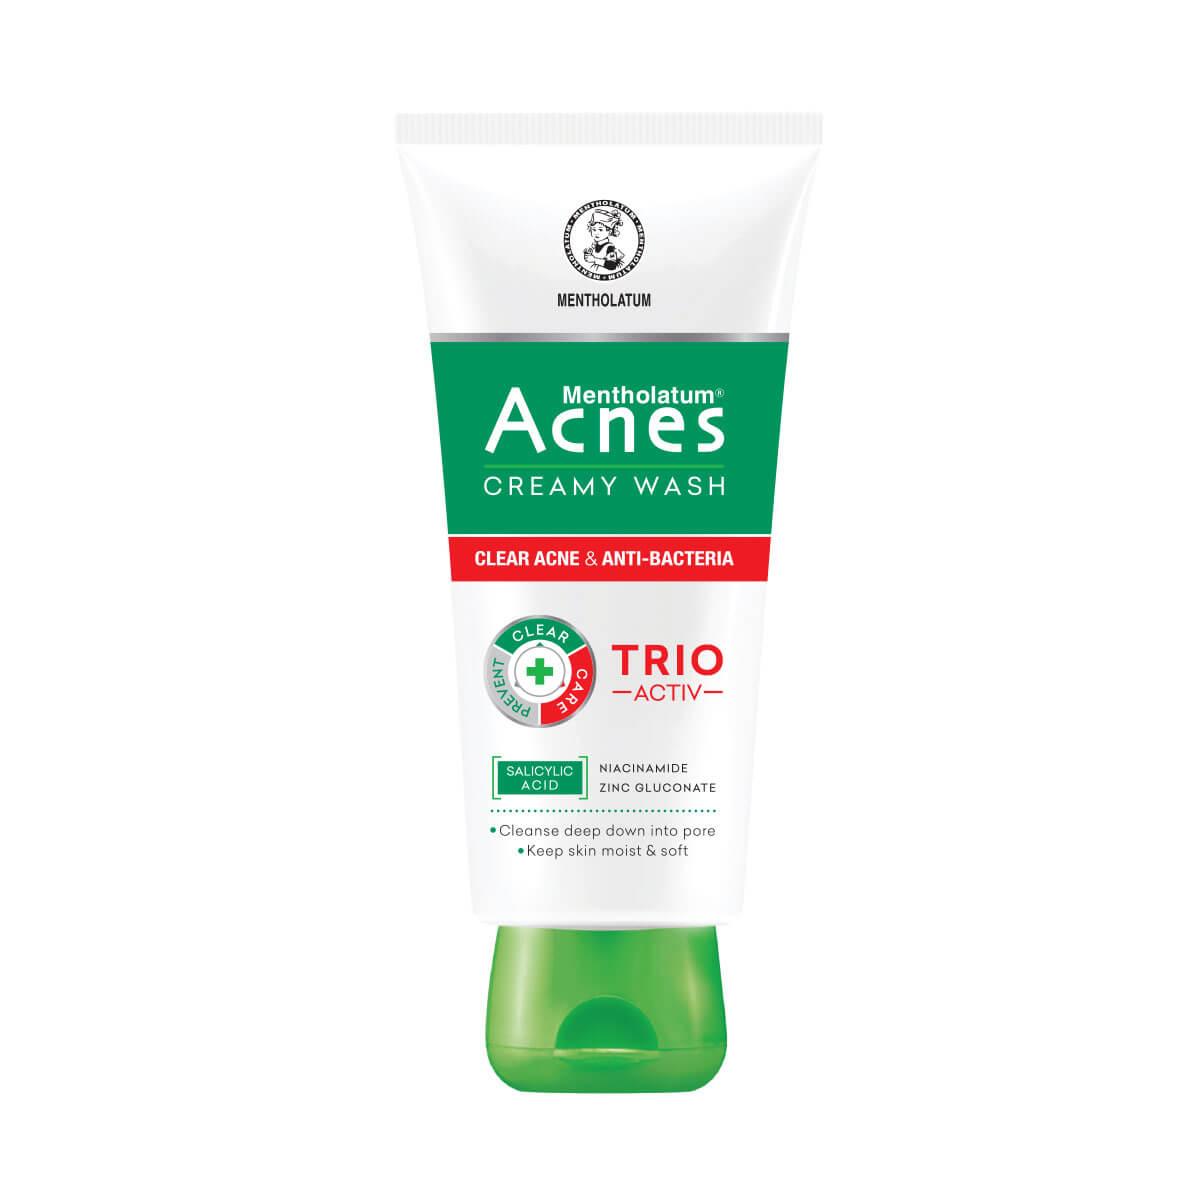 A 25g_Acnes Creamy Wash – Kem rửa mặt ngăn ngừa mụn 5060